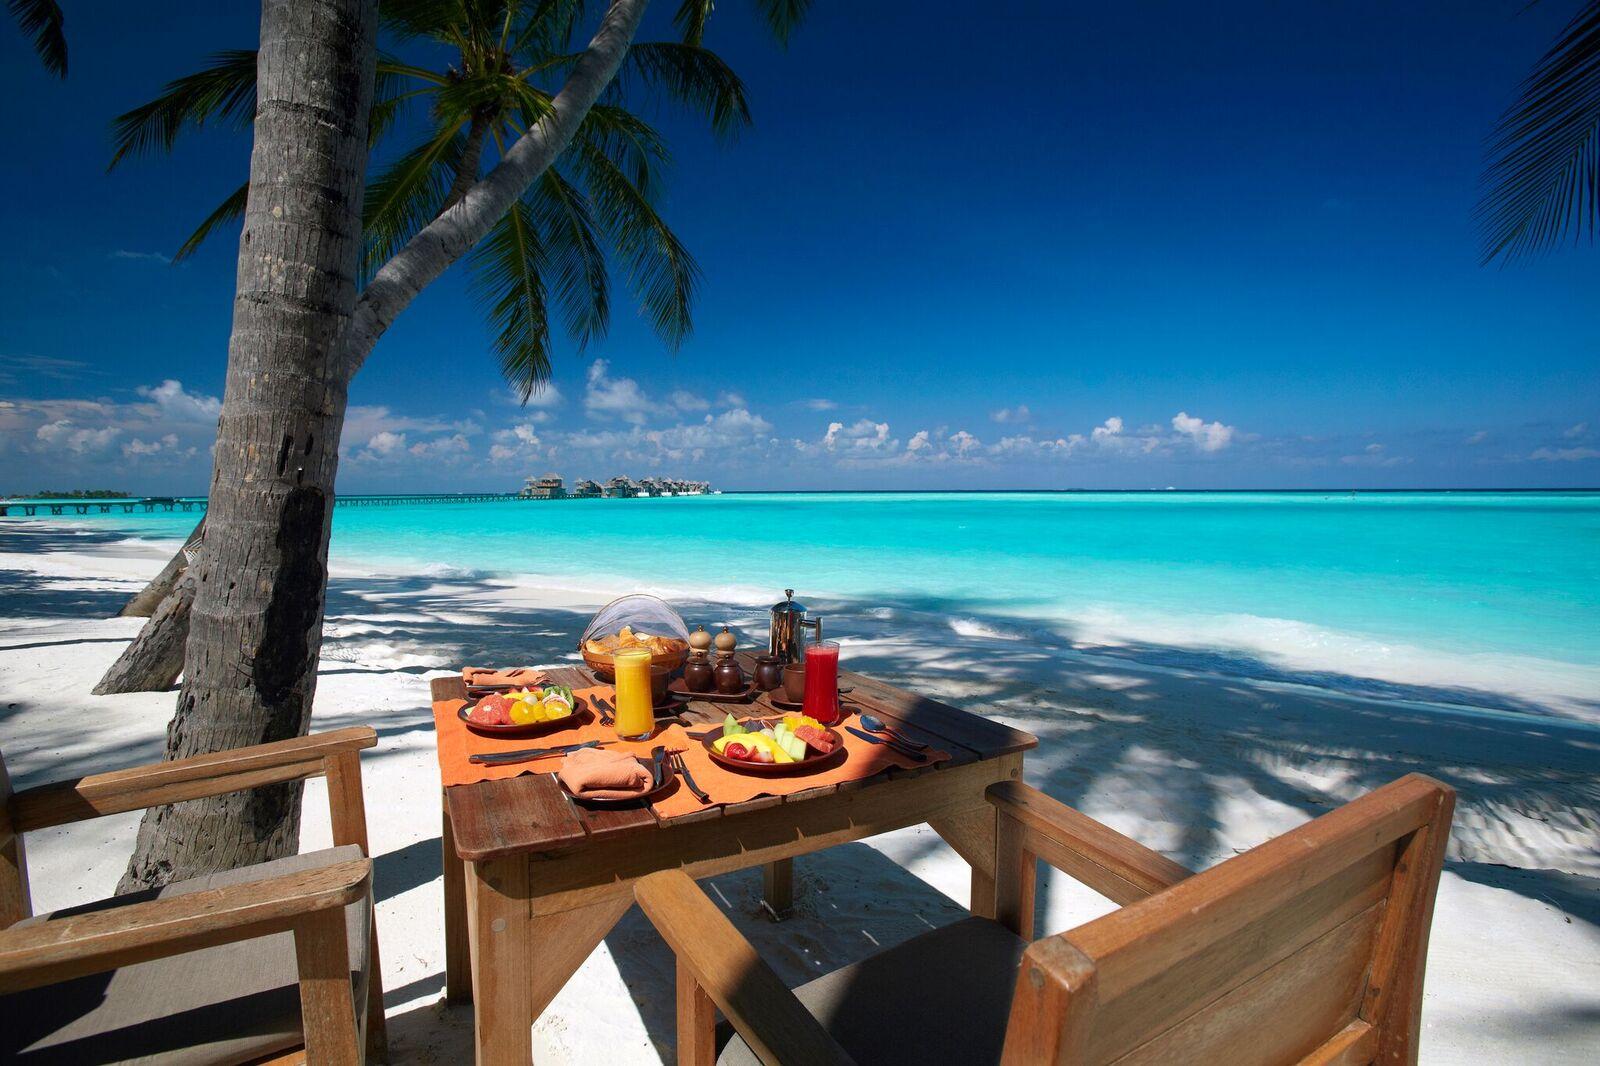 Breakfast by the beach at Main Restaurant